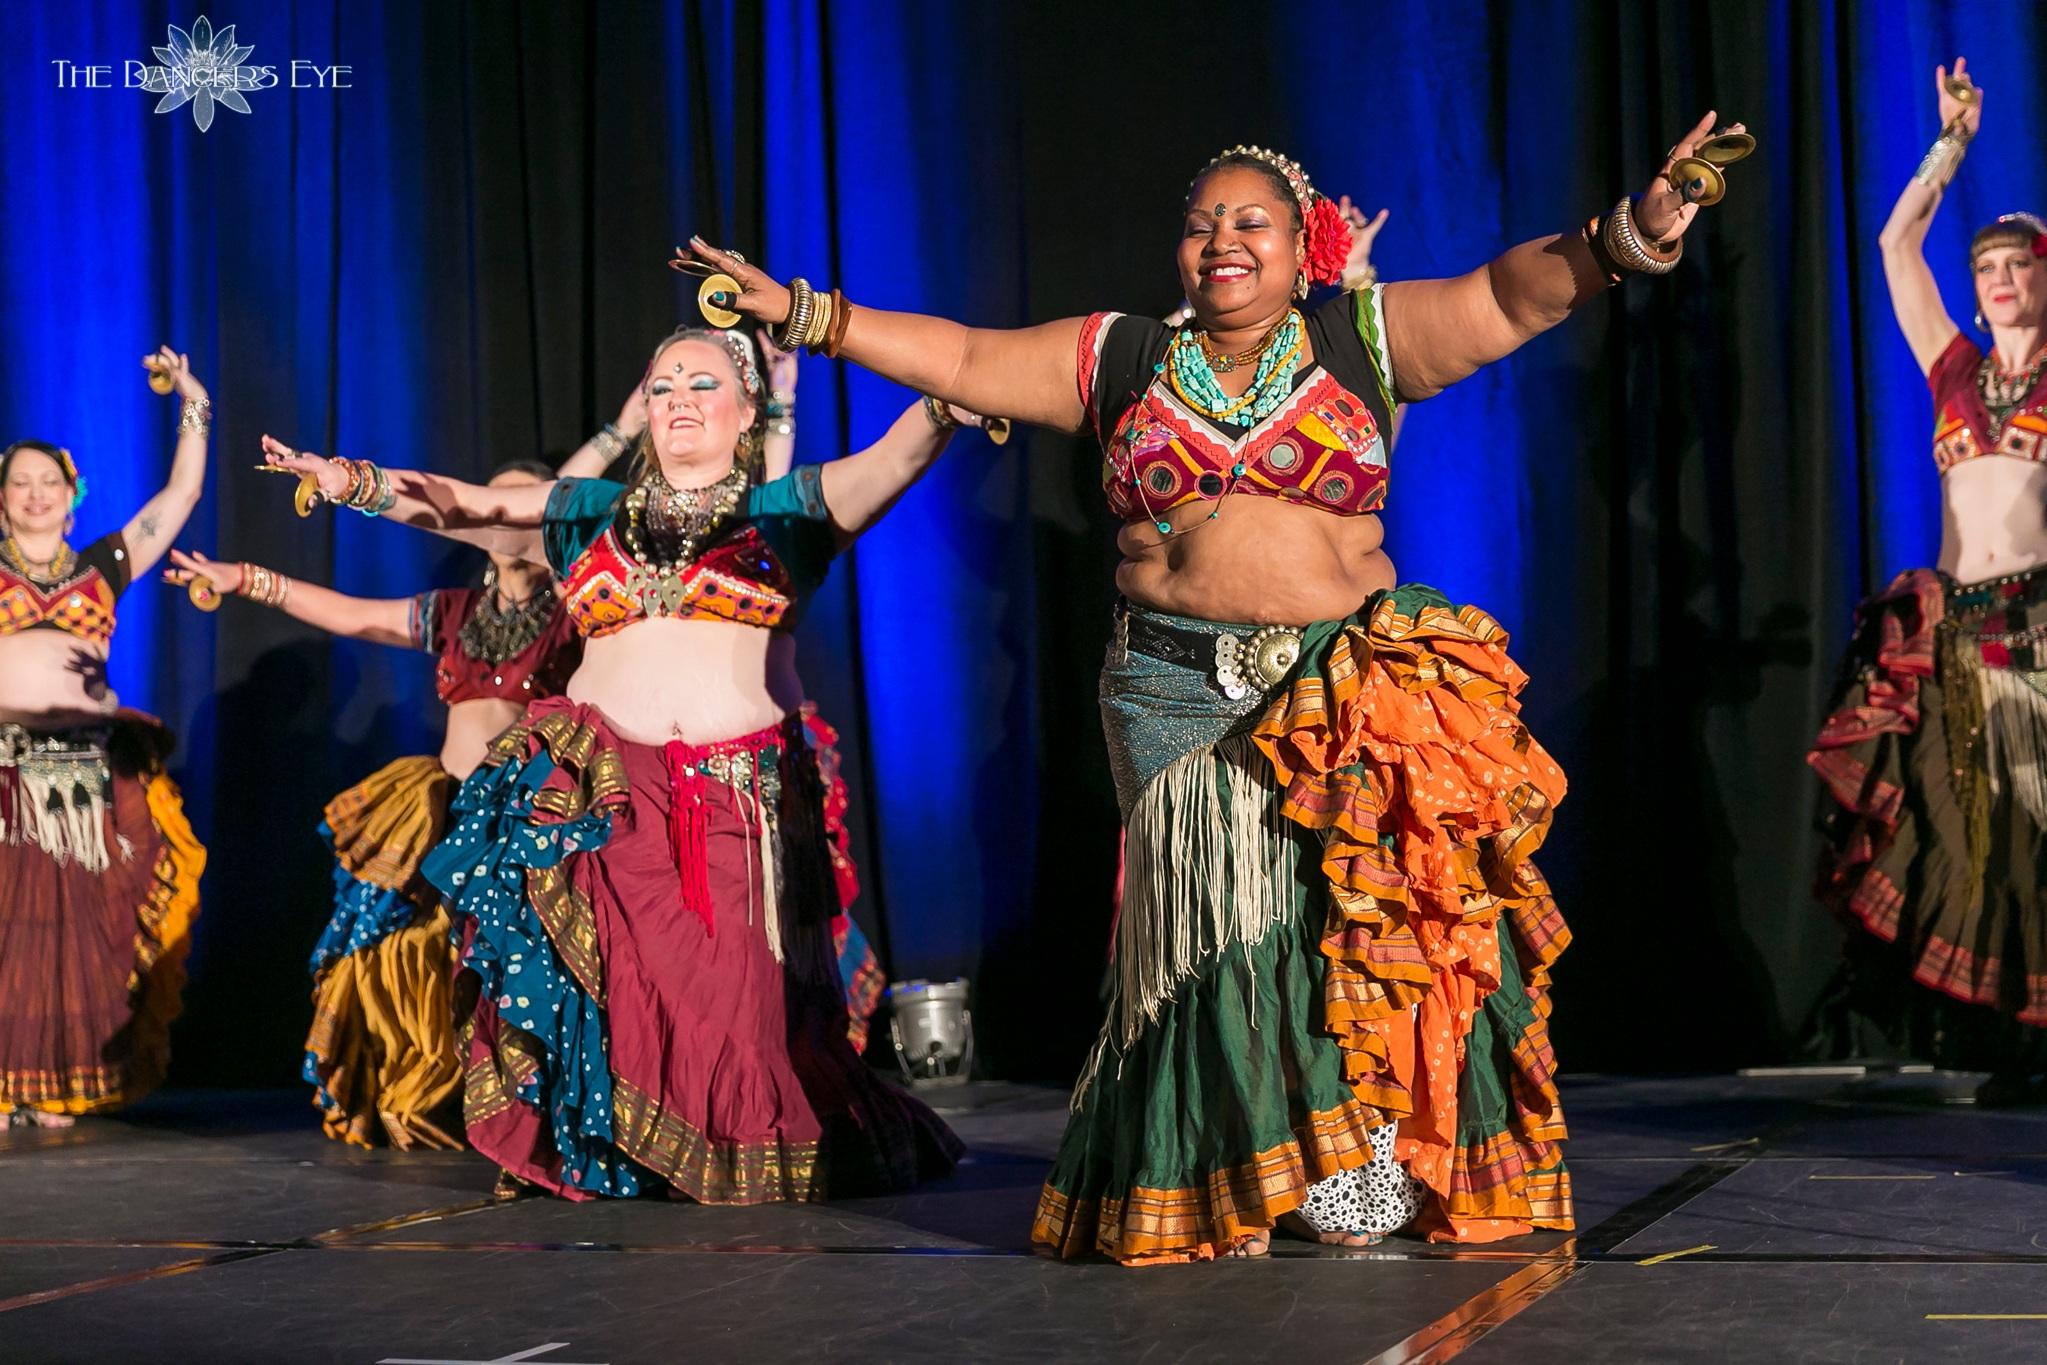 Debbie and Karen perform at ATS Reunion in Phoenix, AZ